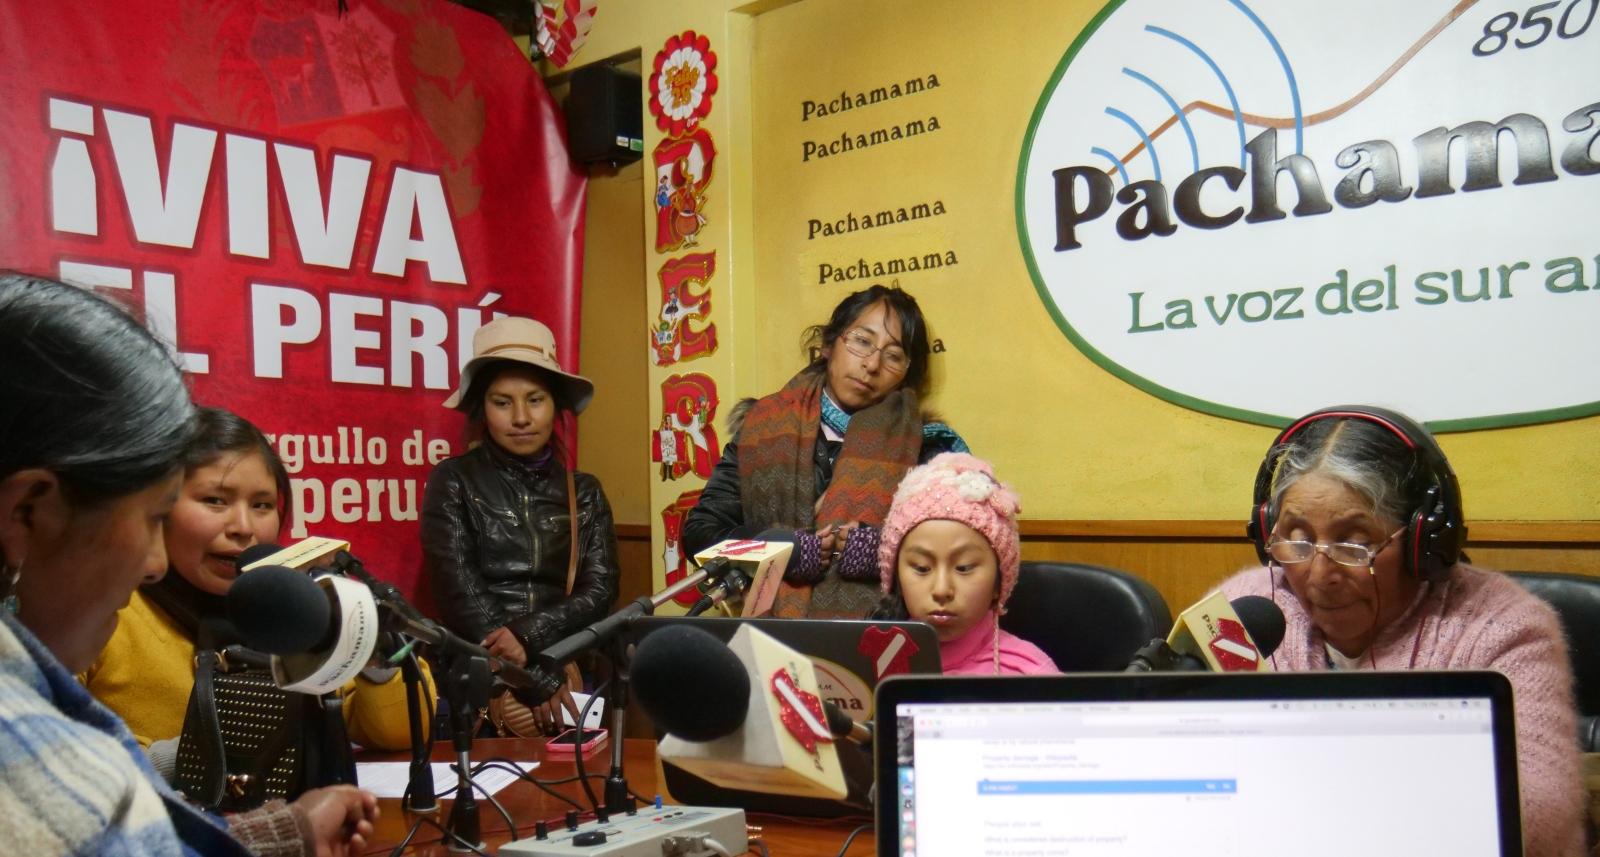 winay-pankara-broadcast.jpg